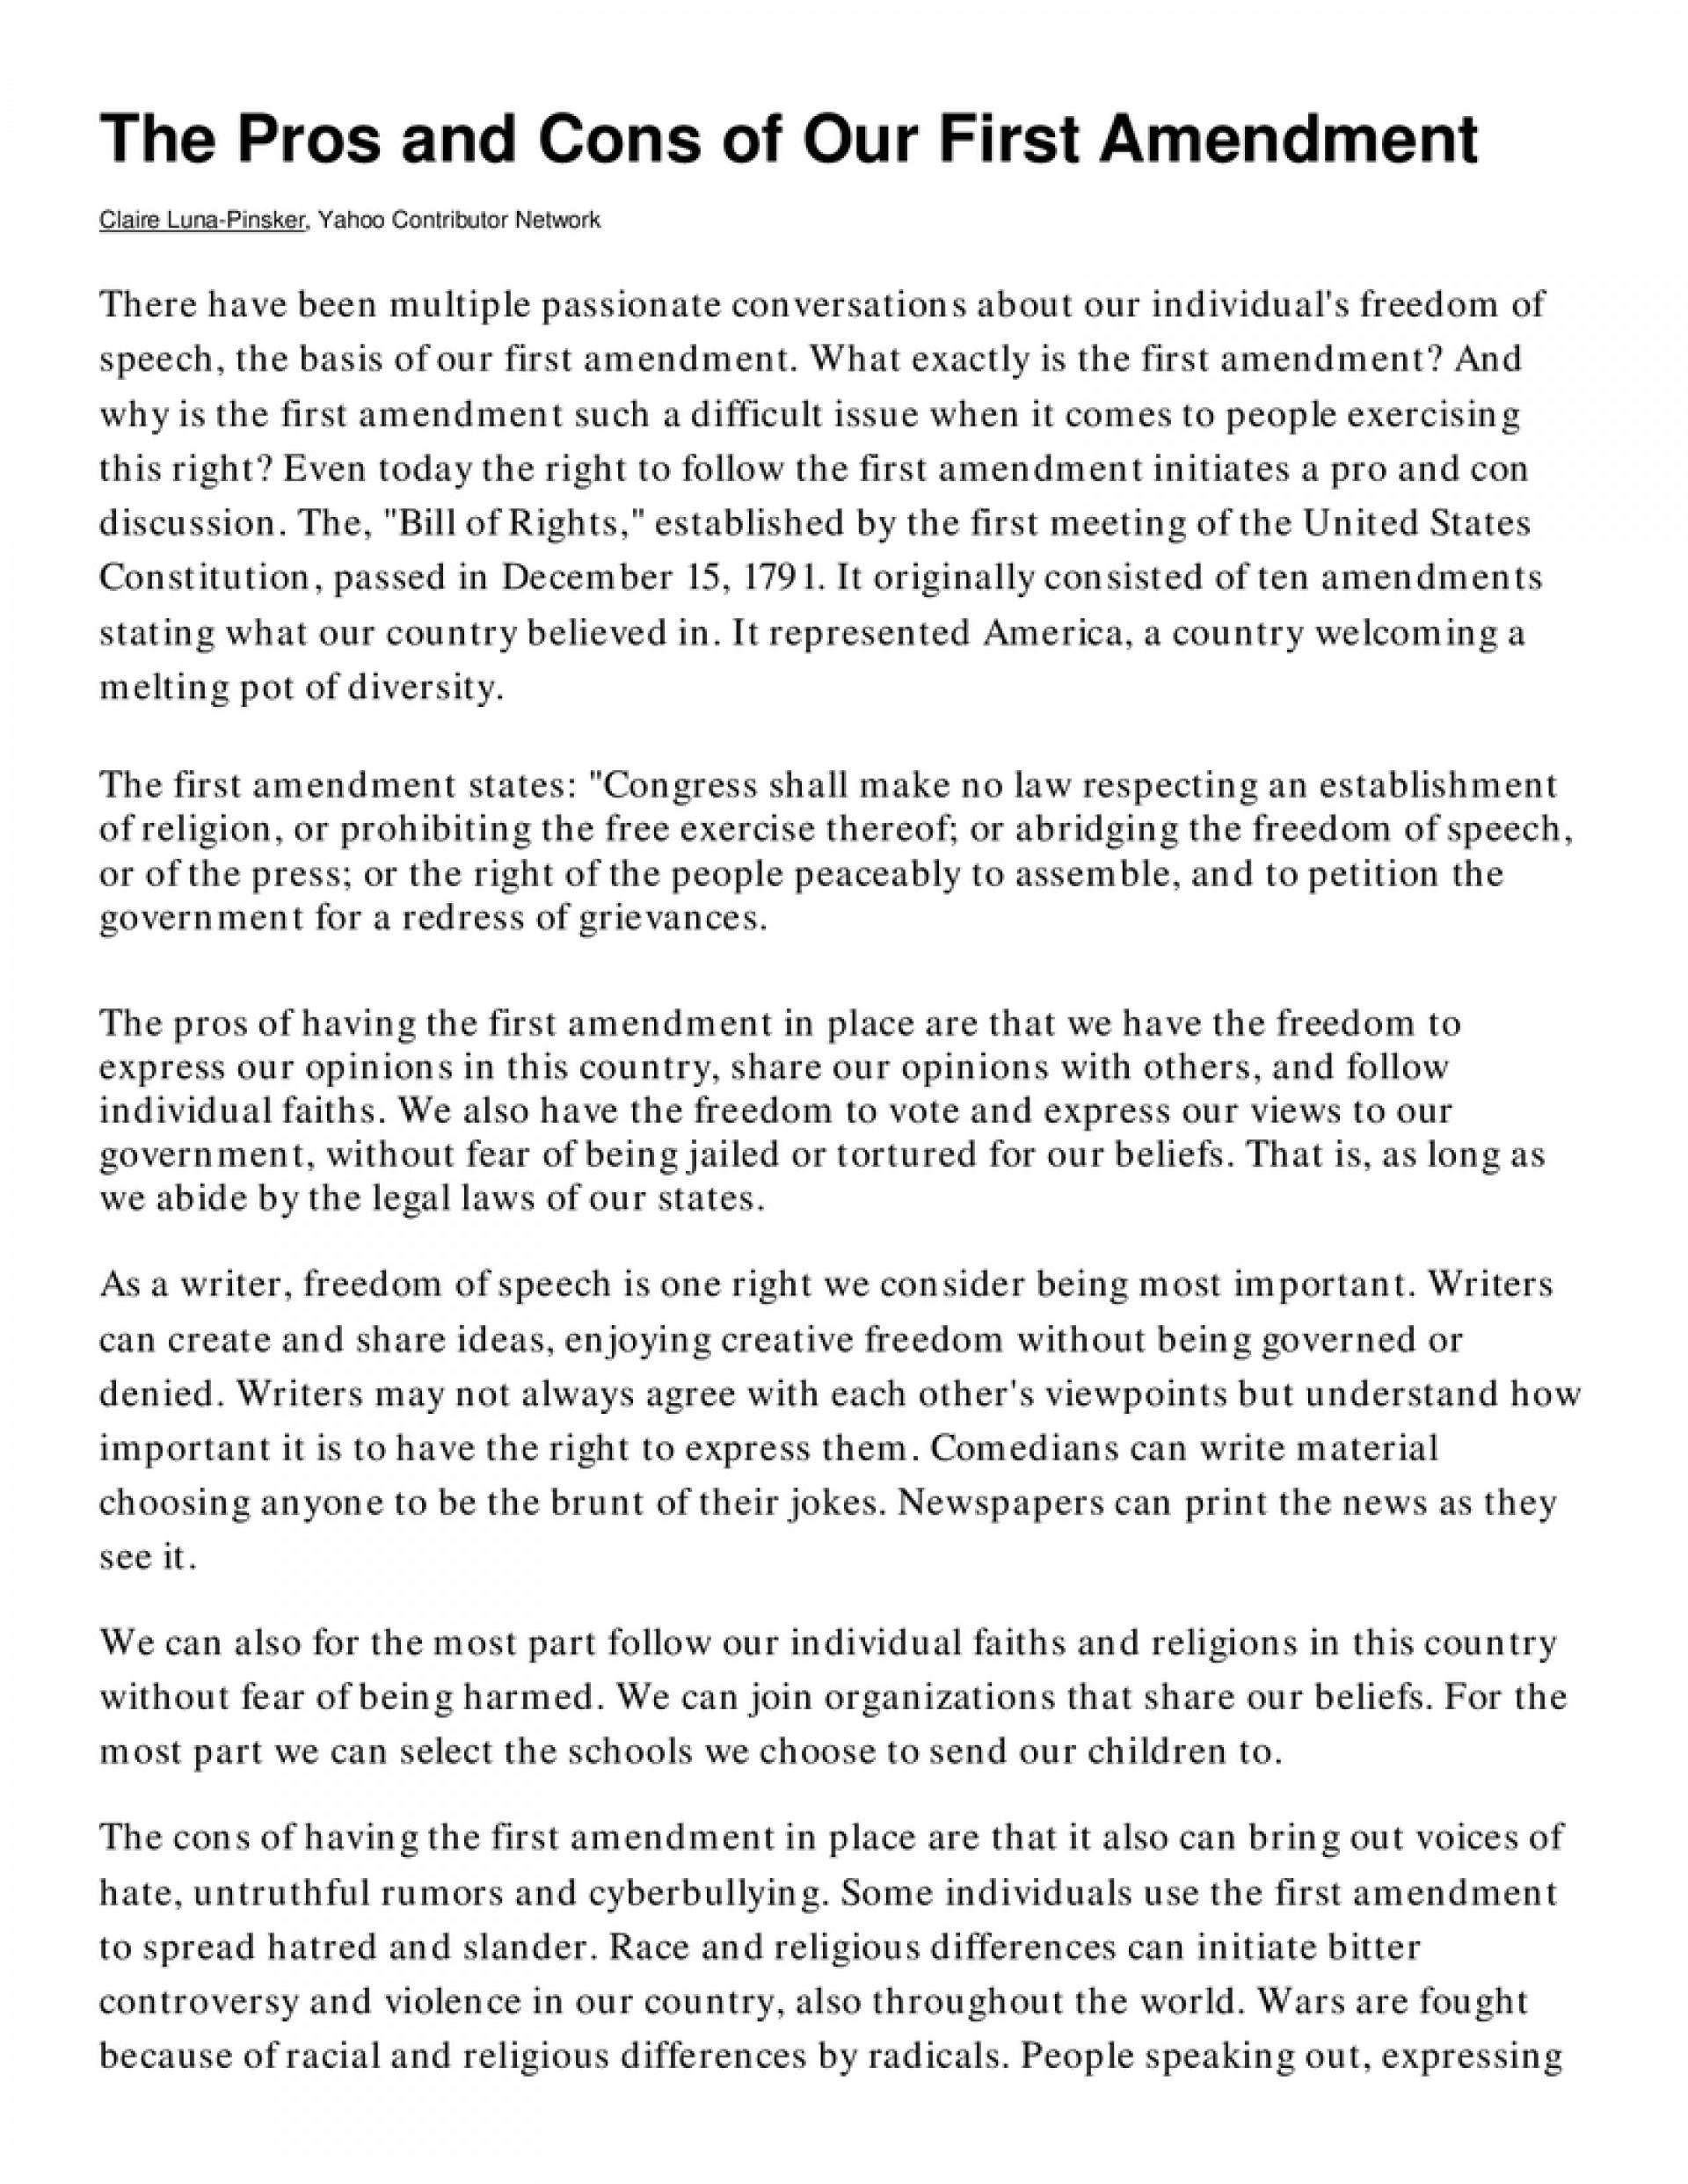 The First Amendment - Essay